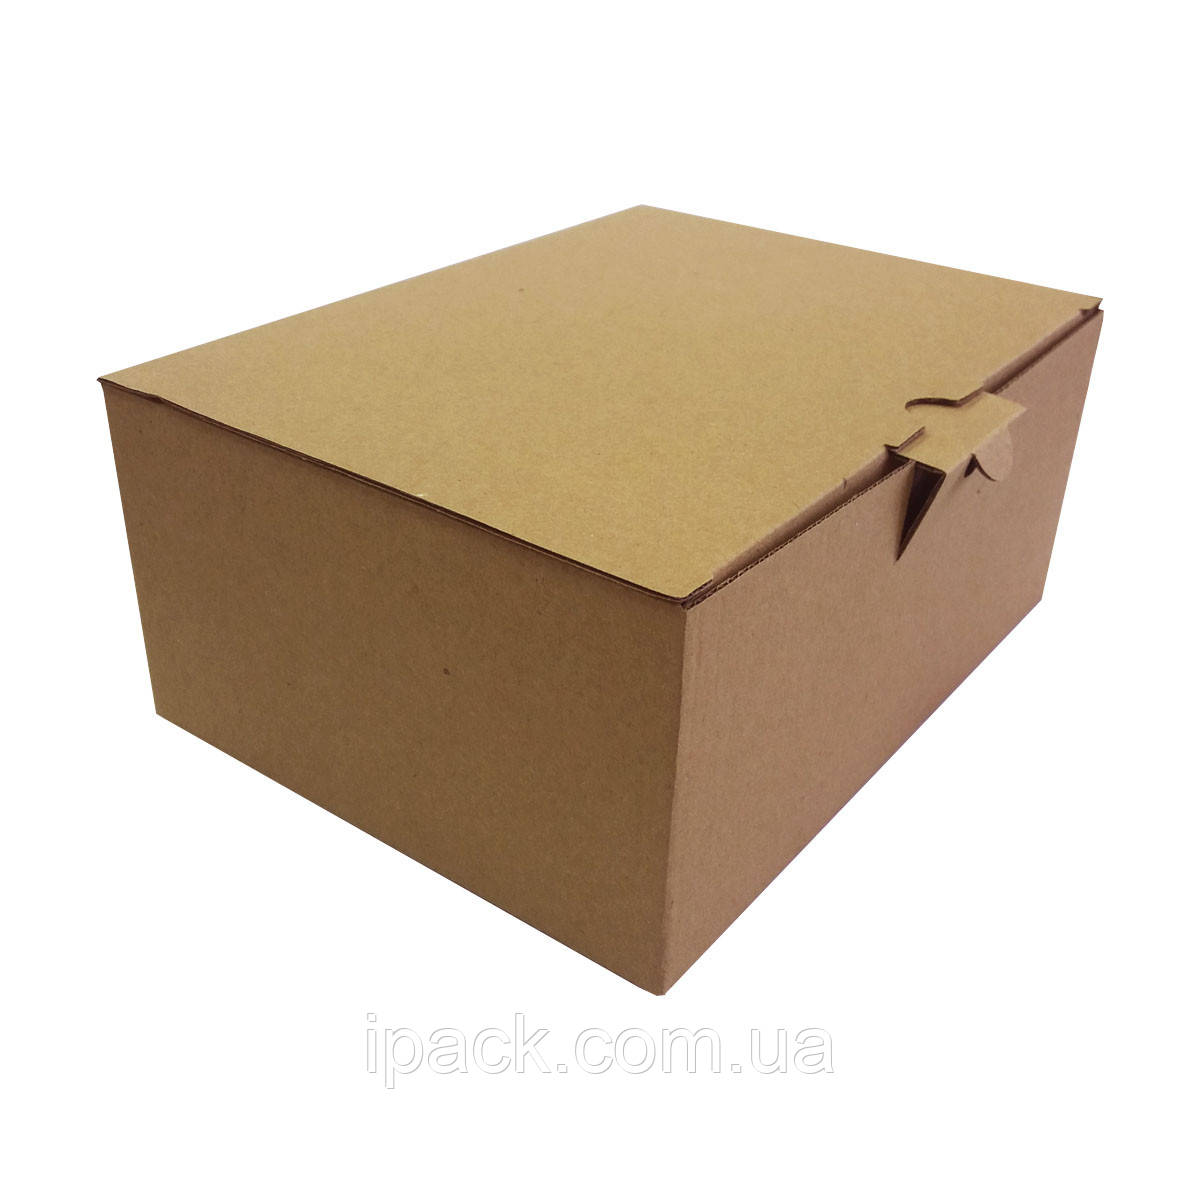 Коробка картонная самосборная 230*175*100 мм бурая крафт микрогофрокартон